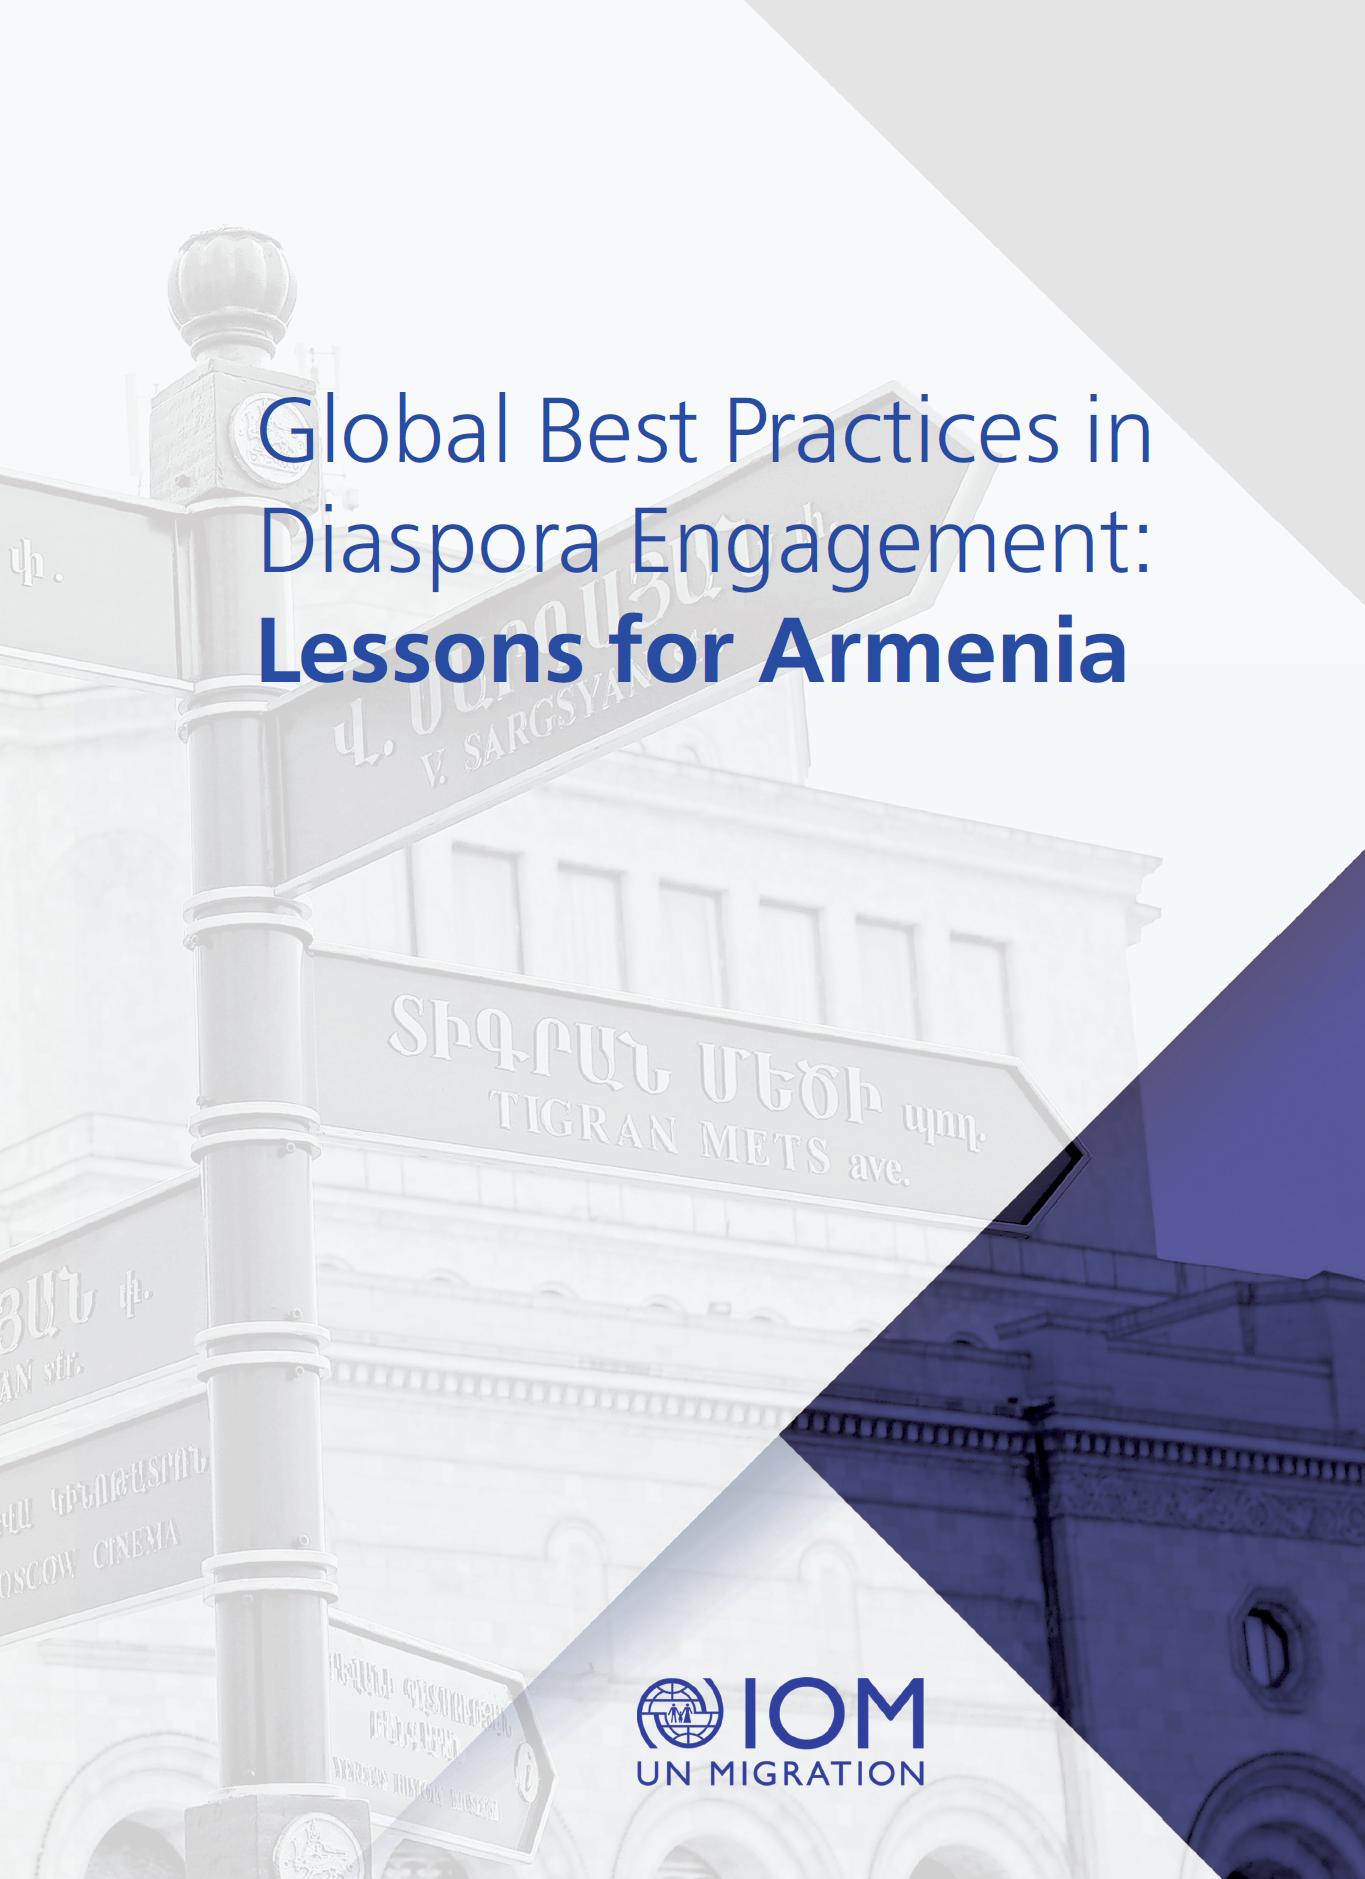 Global Best Practices in Diaspora Engagement